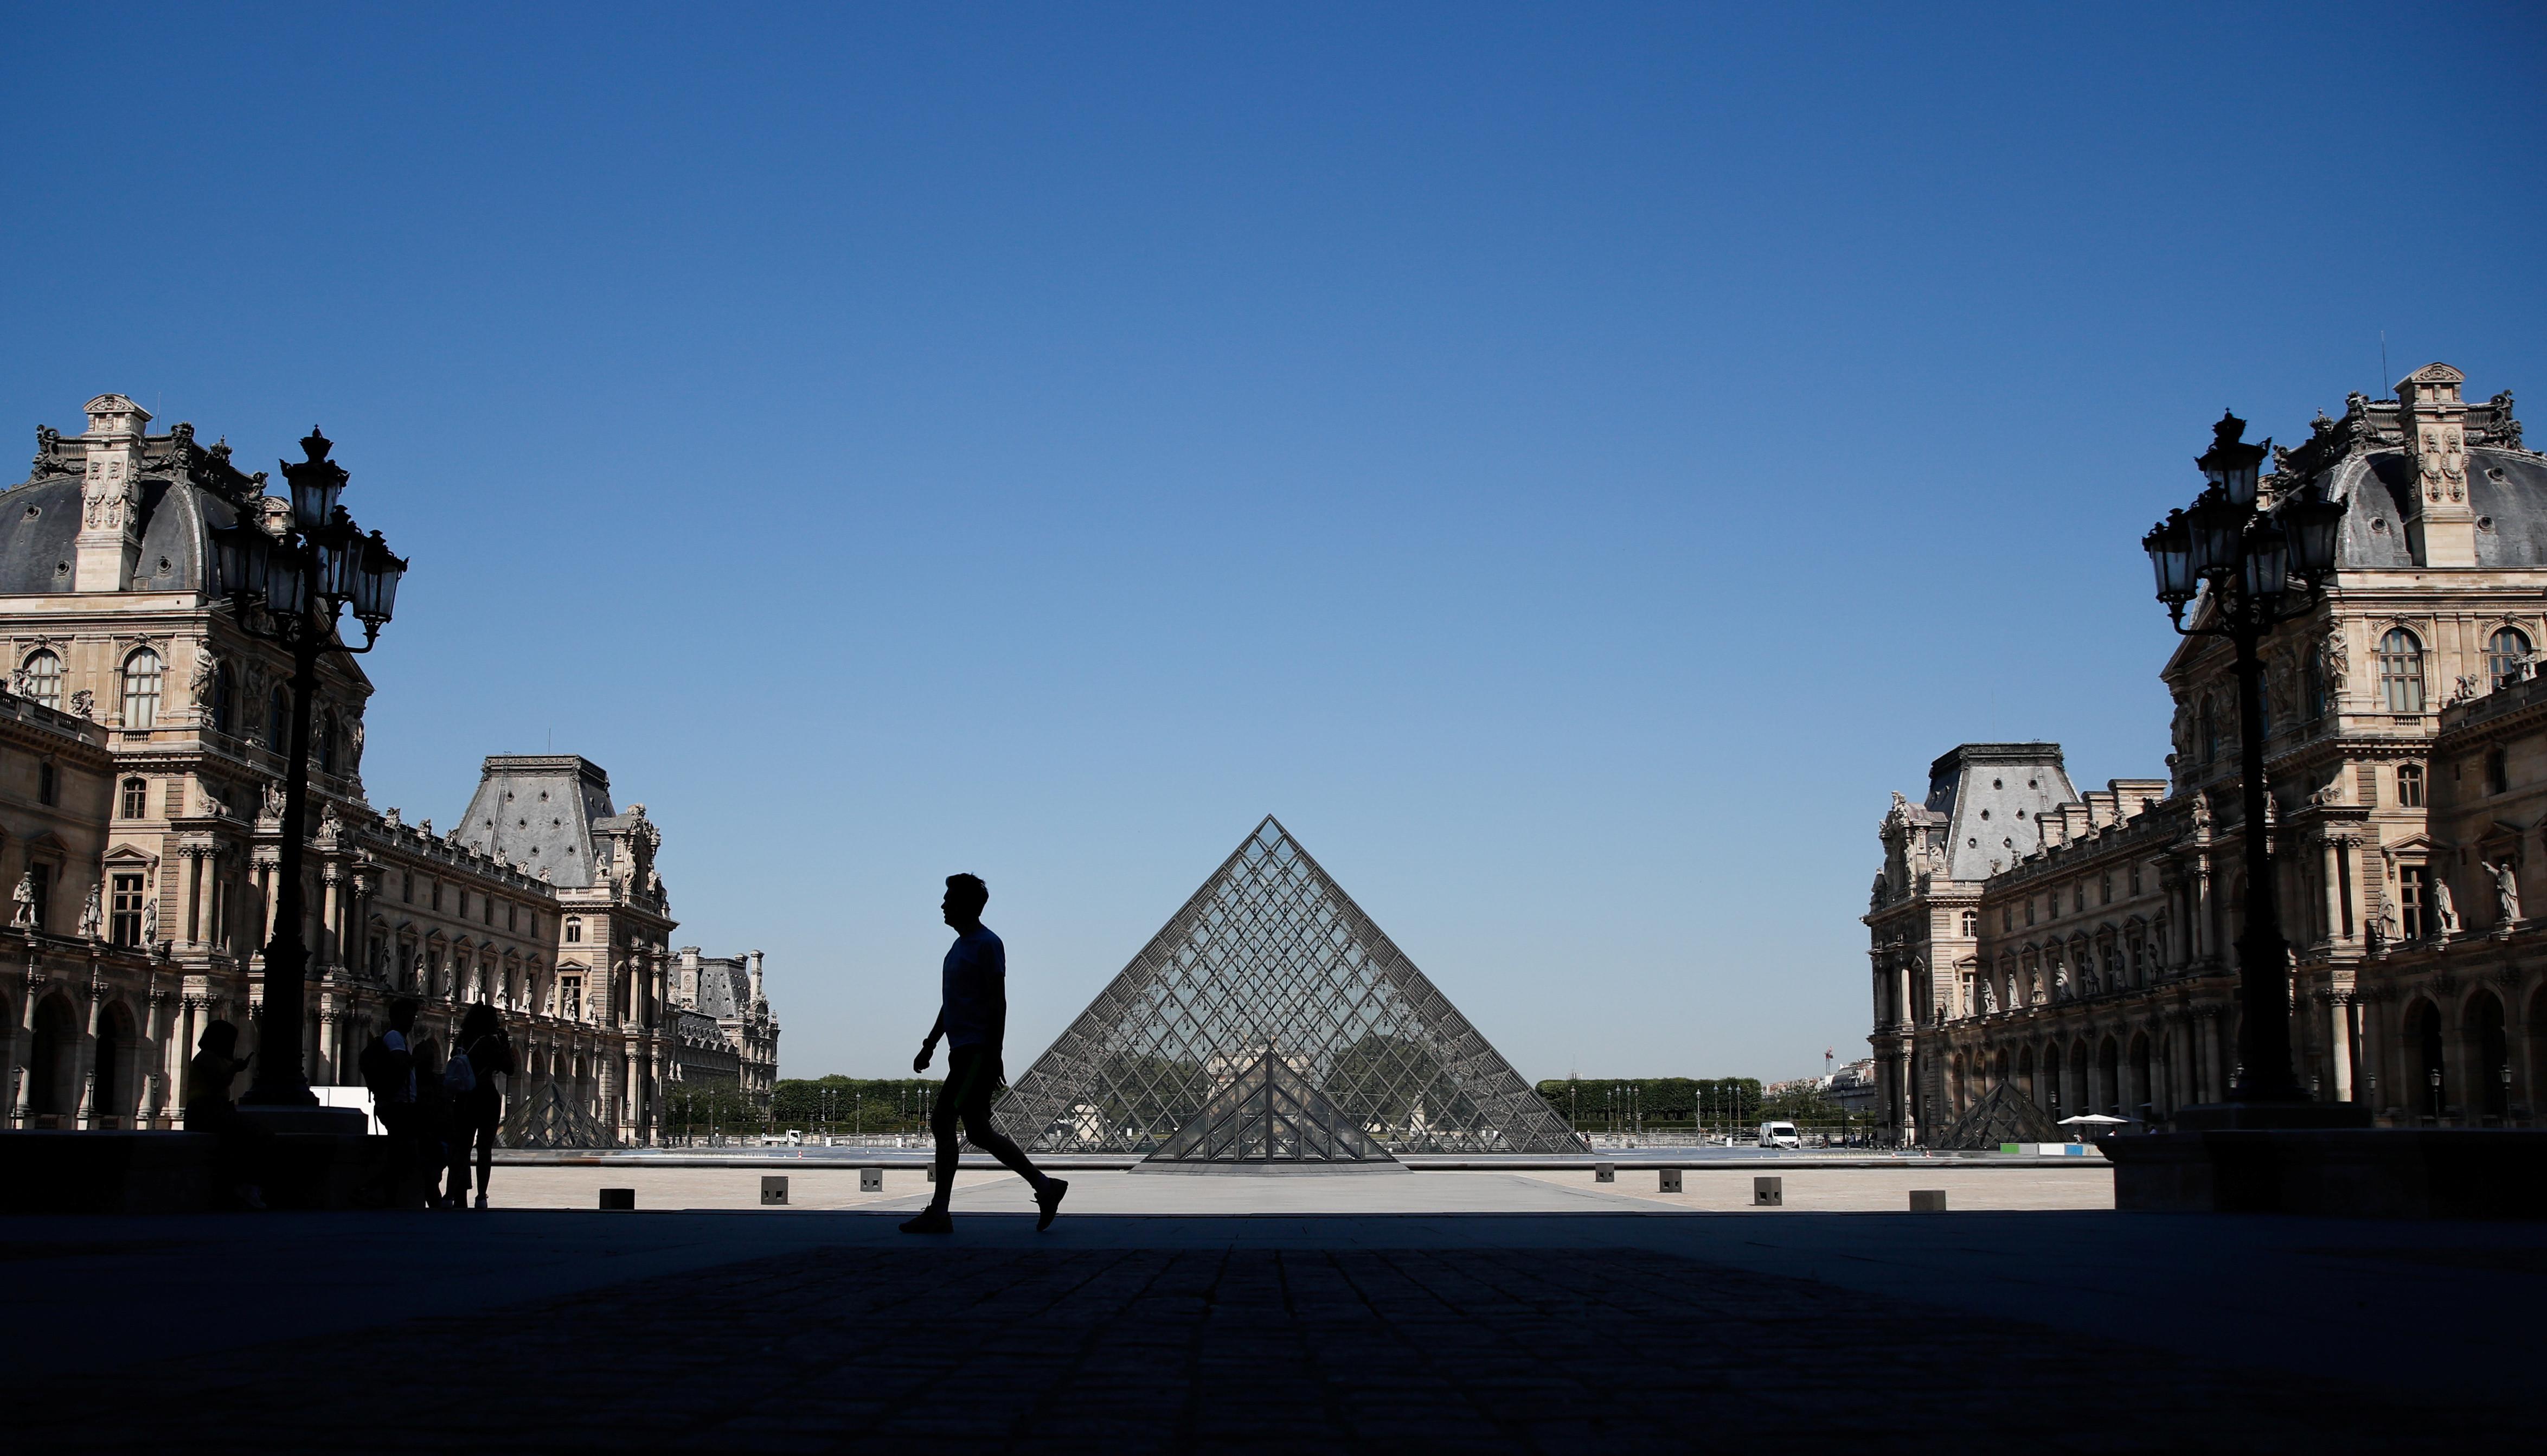 A man walks near the Louvre Pyramid